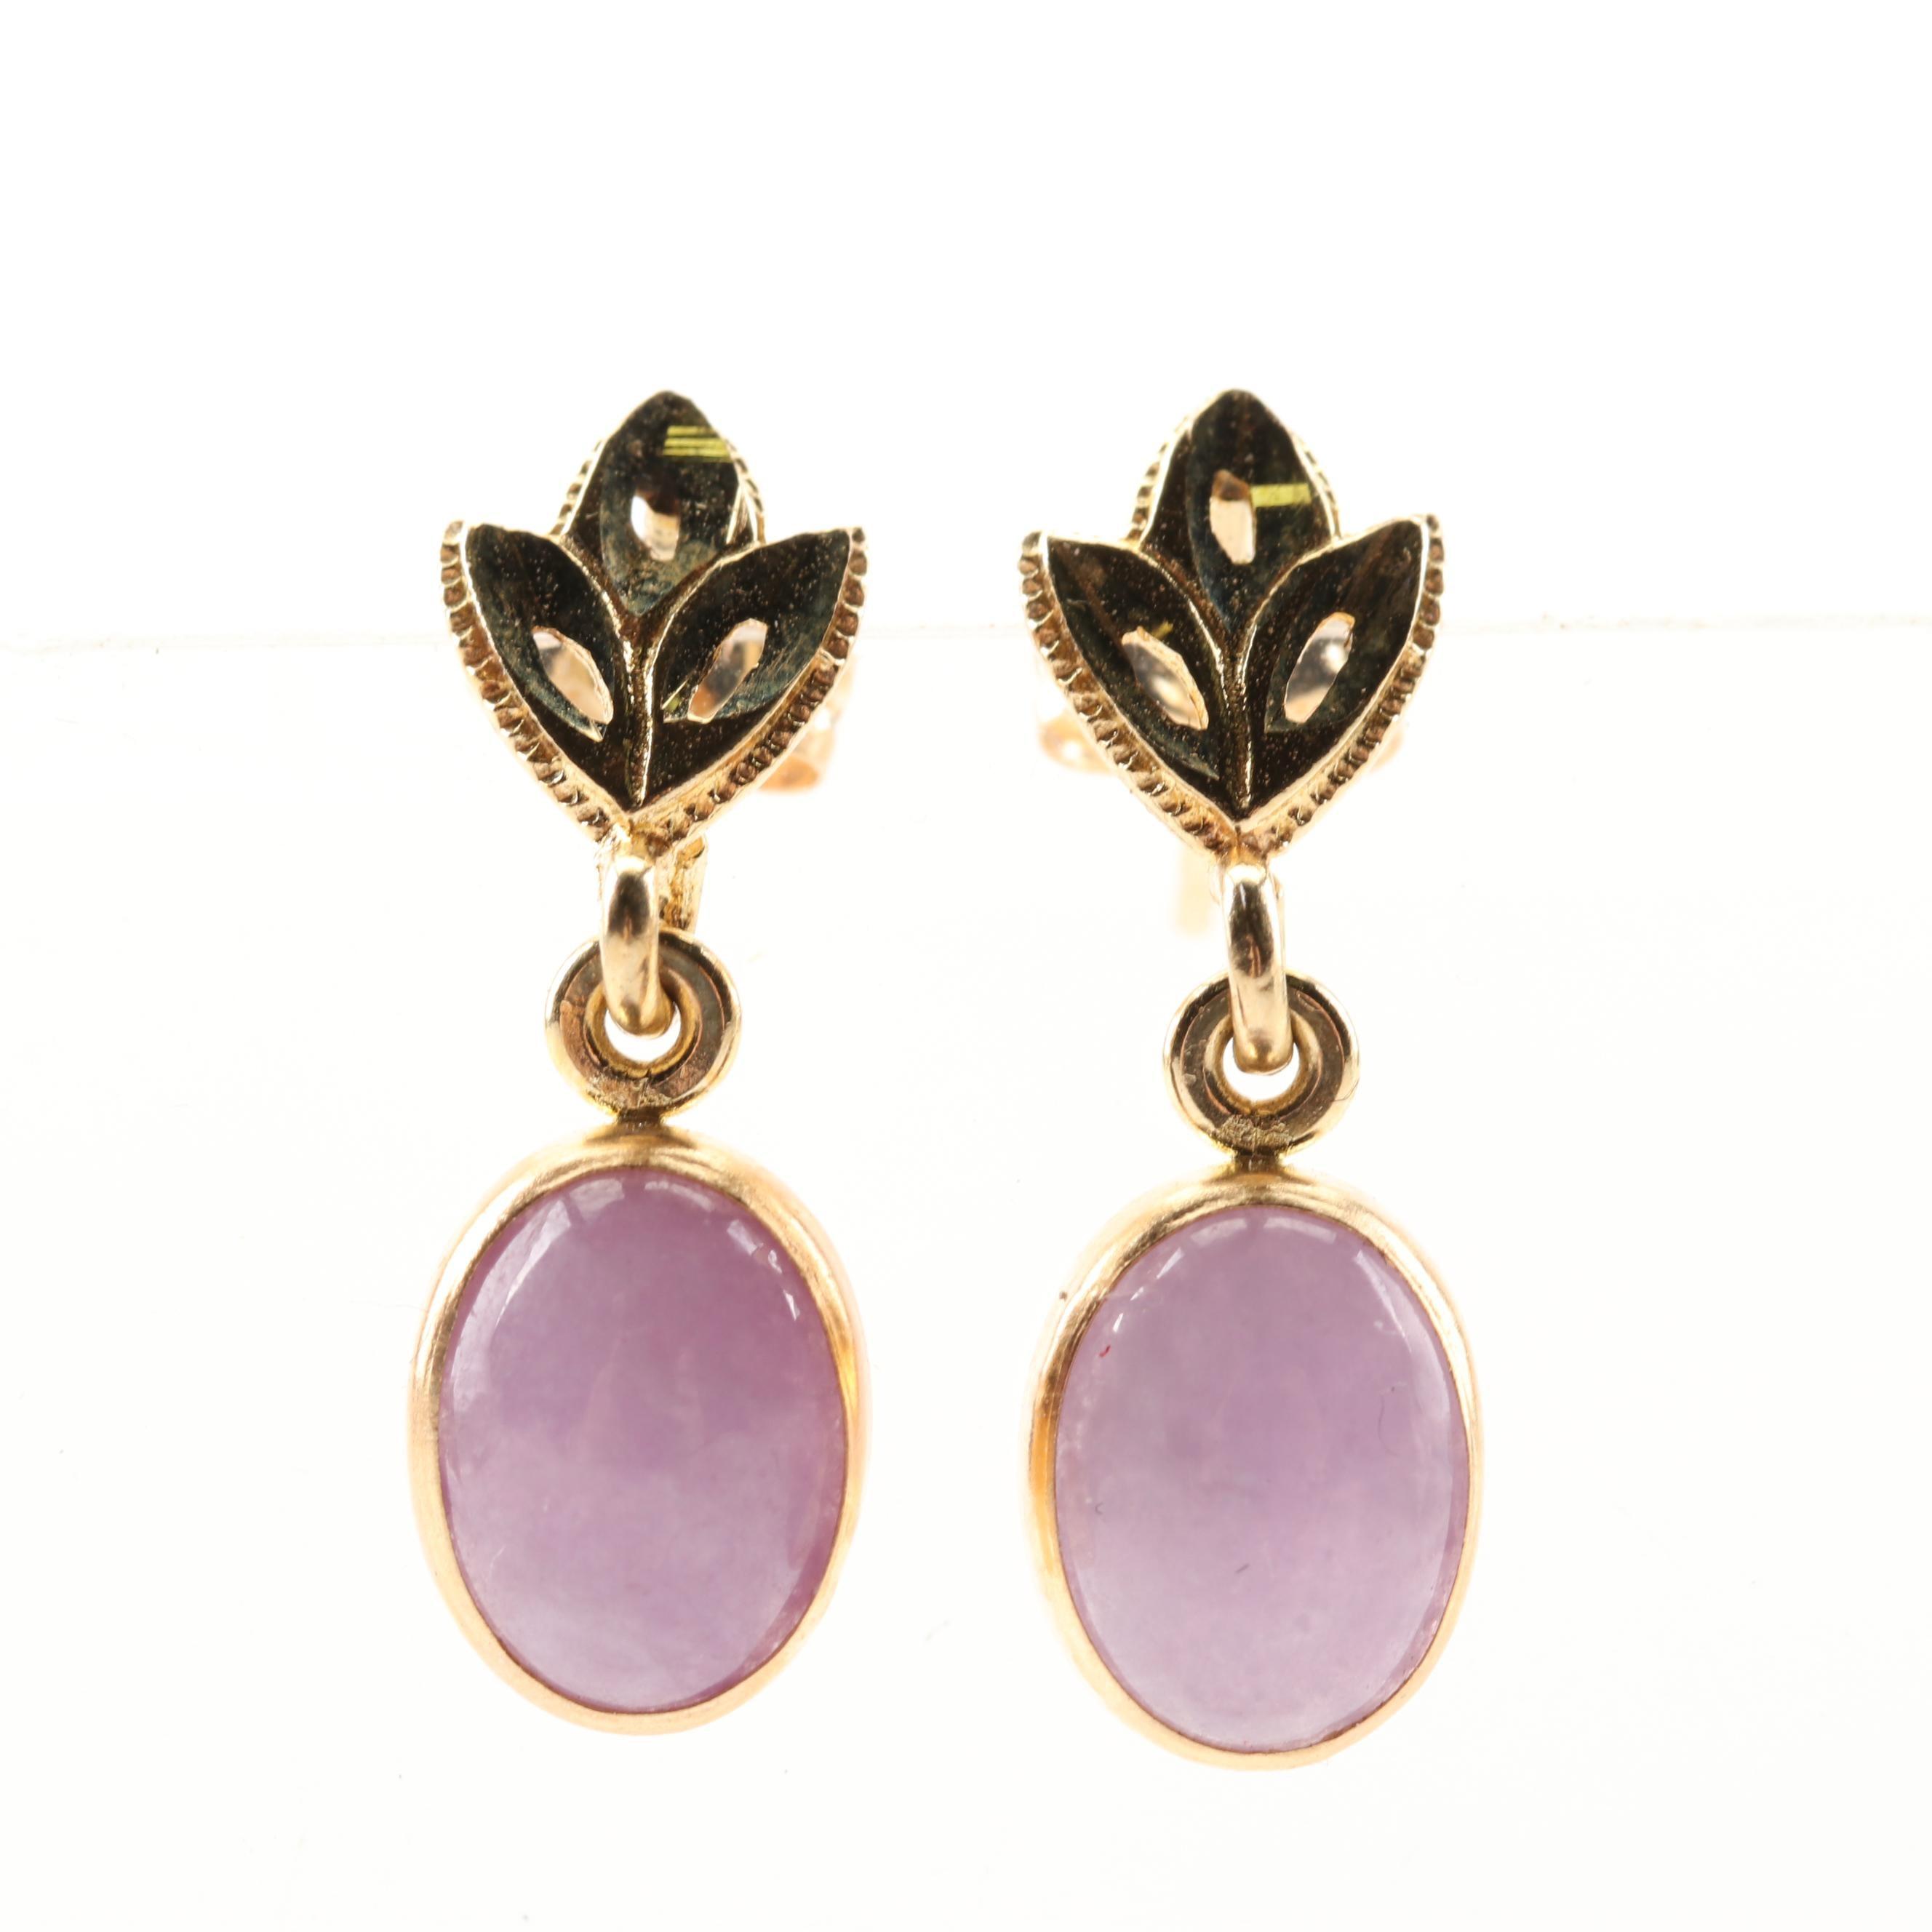 14K Yellow Gold 2.50 CTW Jadeite Dangle Earrings